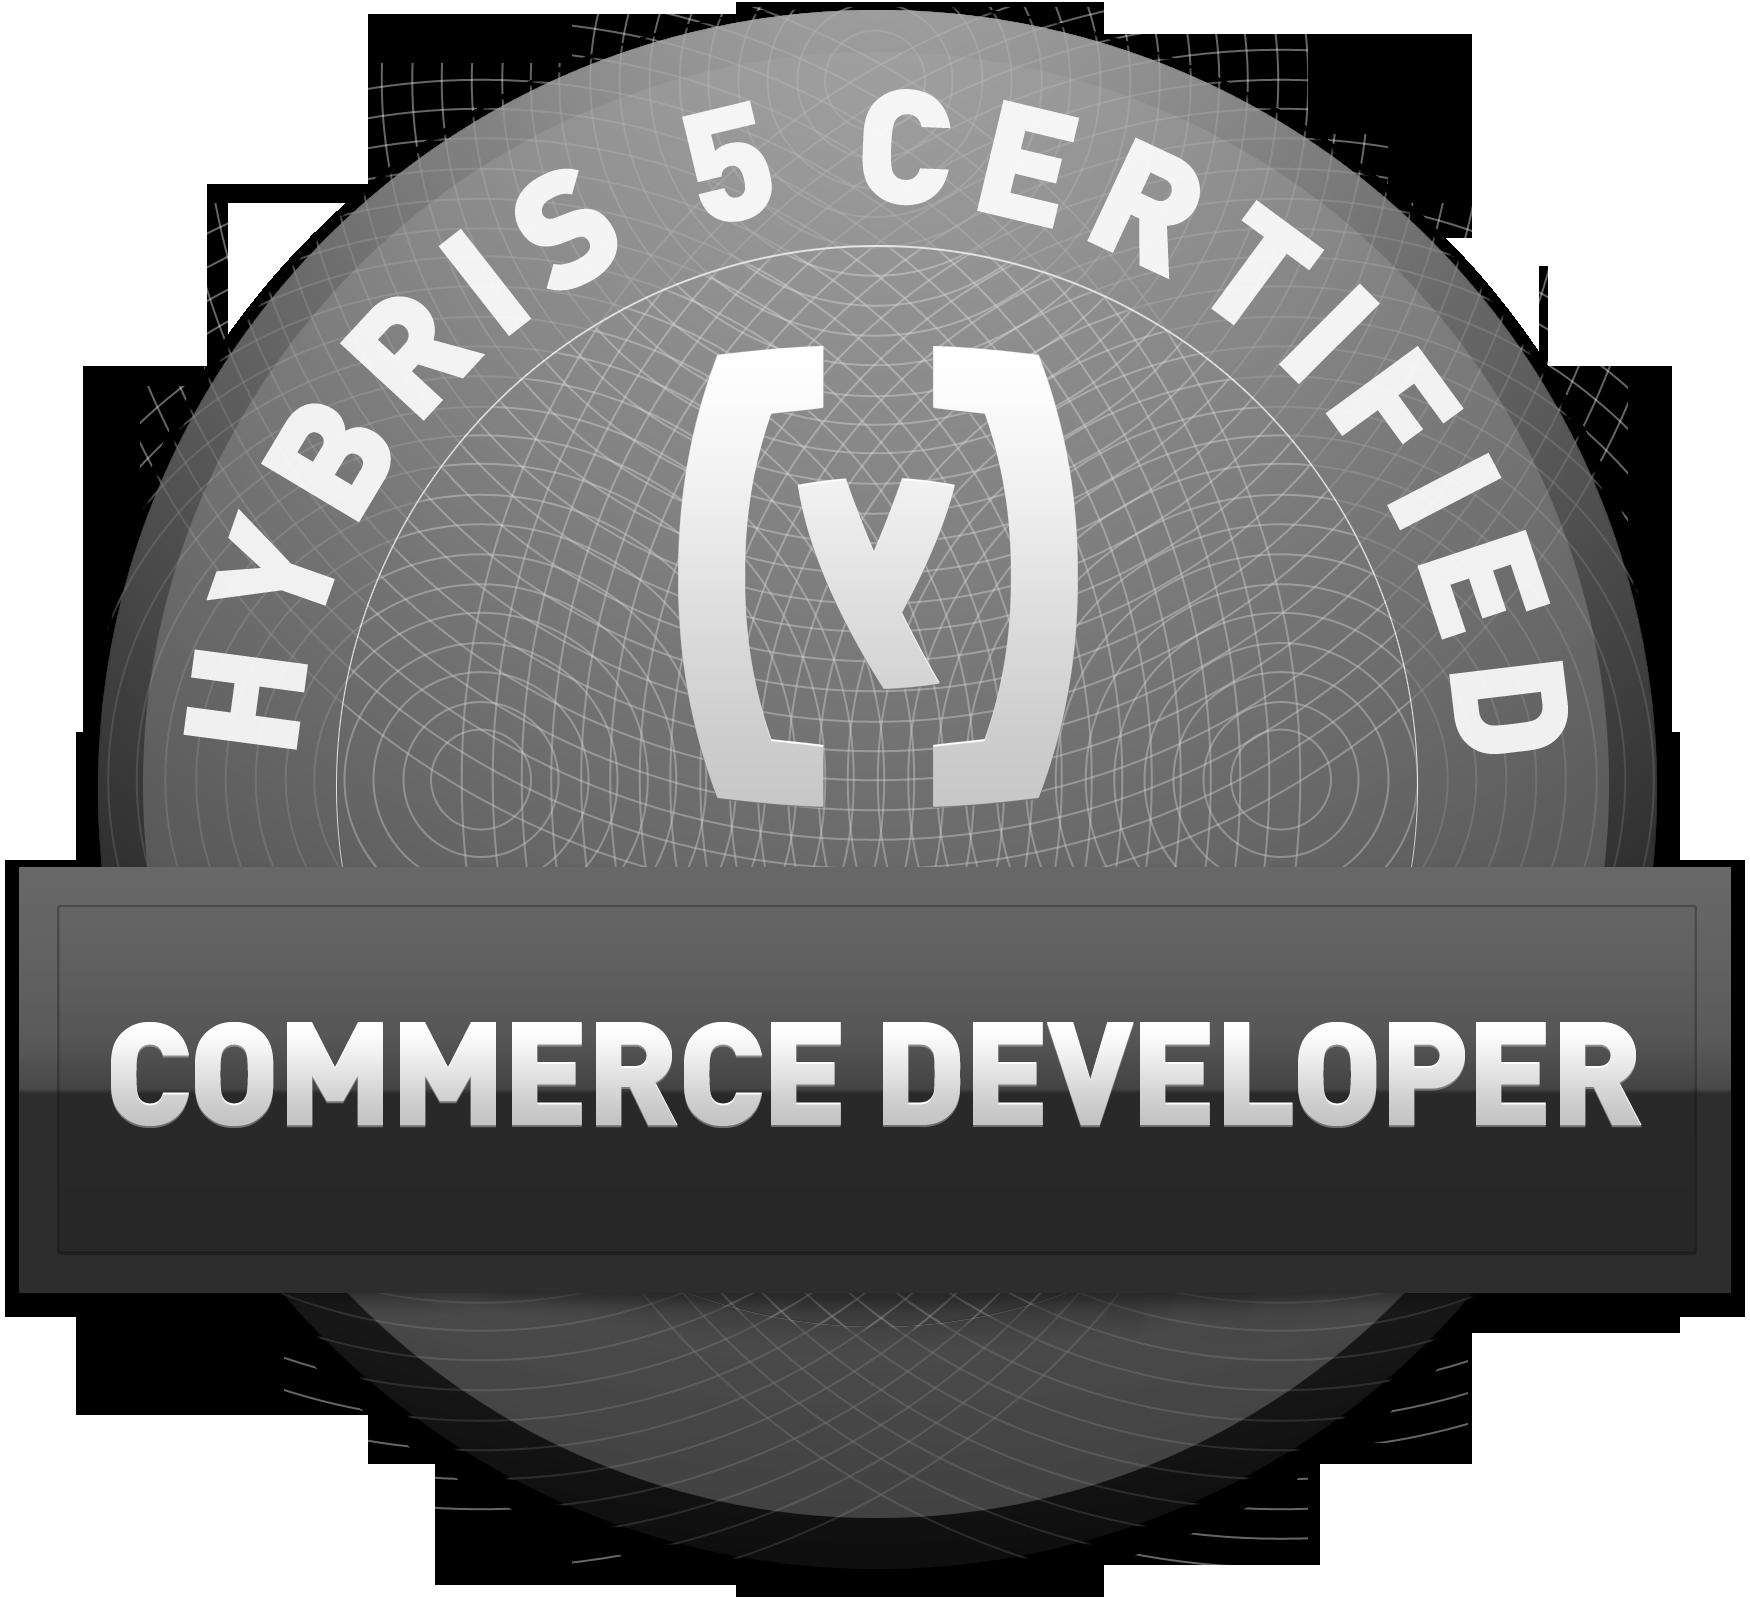 Hybris Ecommerce V5 Certification Soft Exploration Blog It